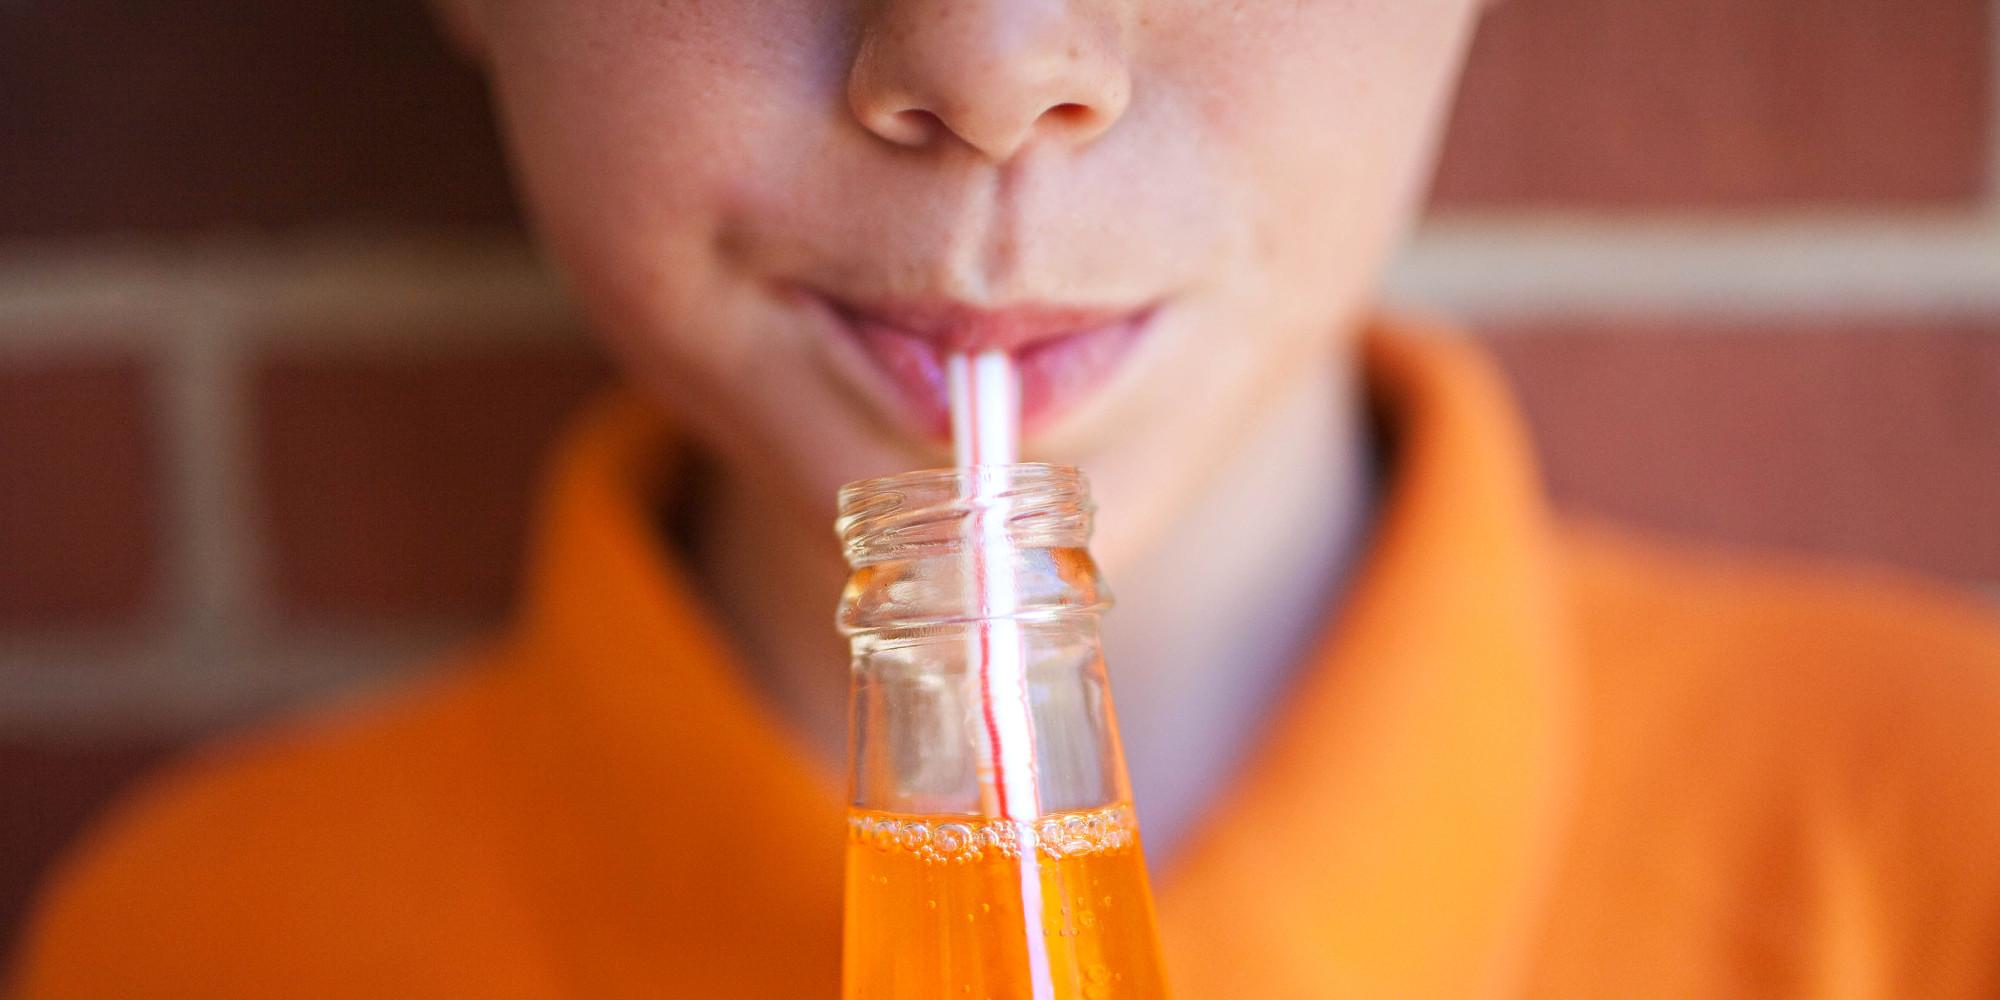 Will Drinking Orange Juice Cause Diabetes